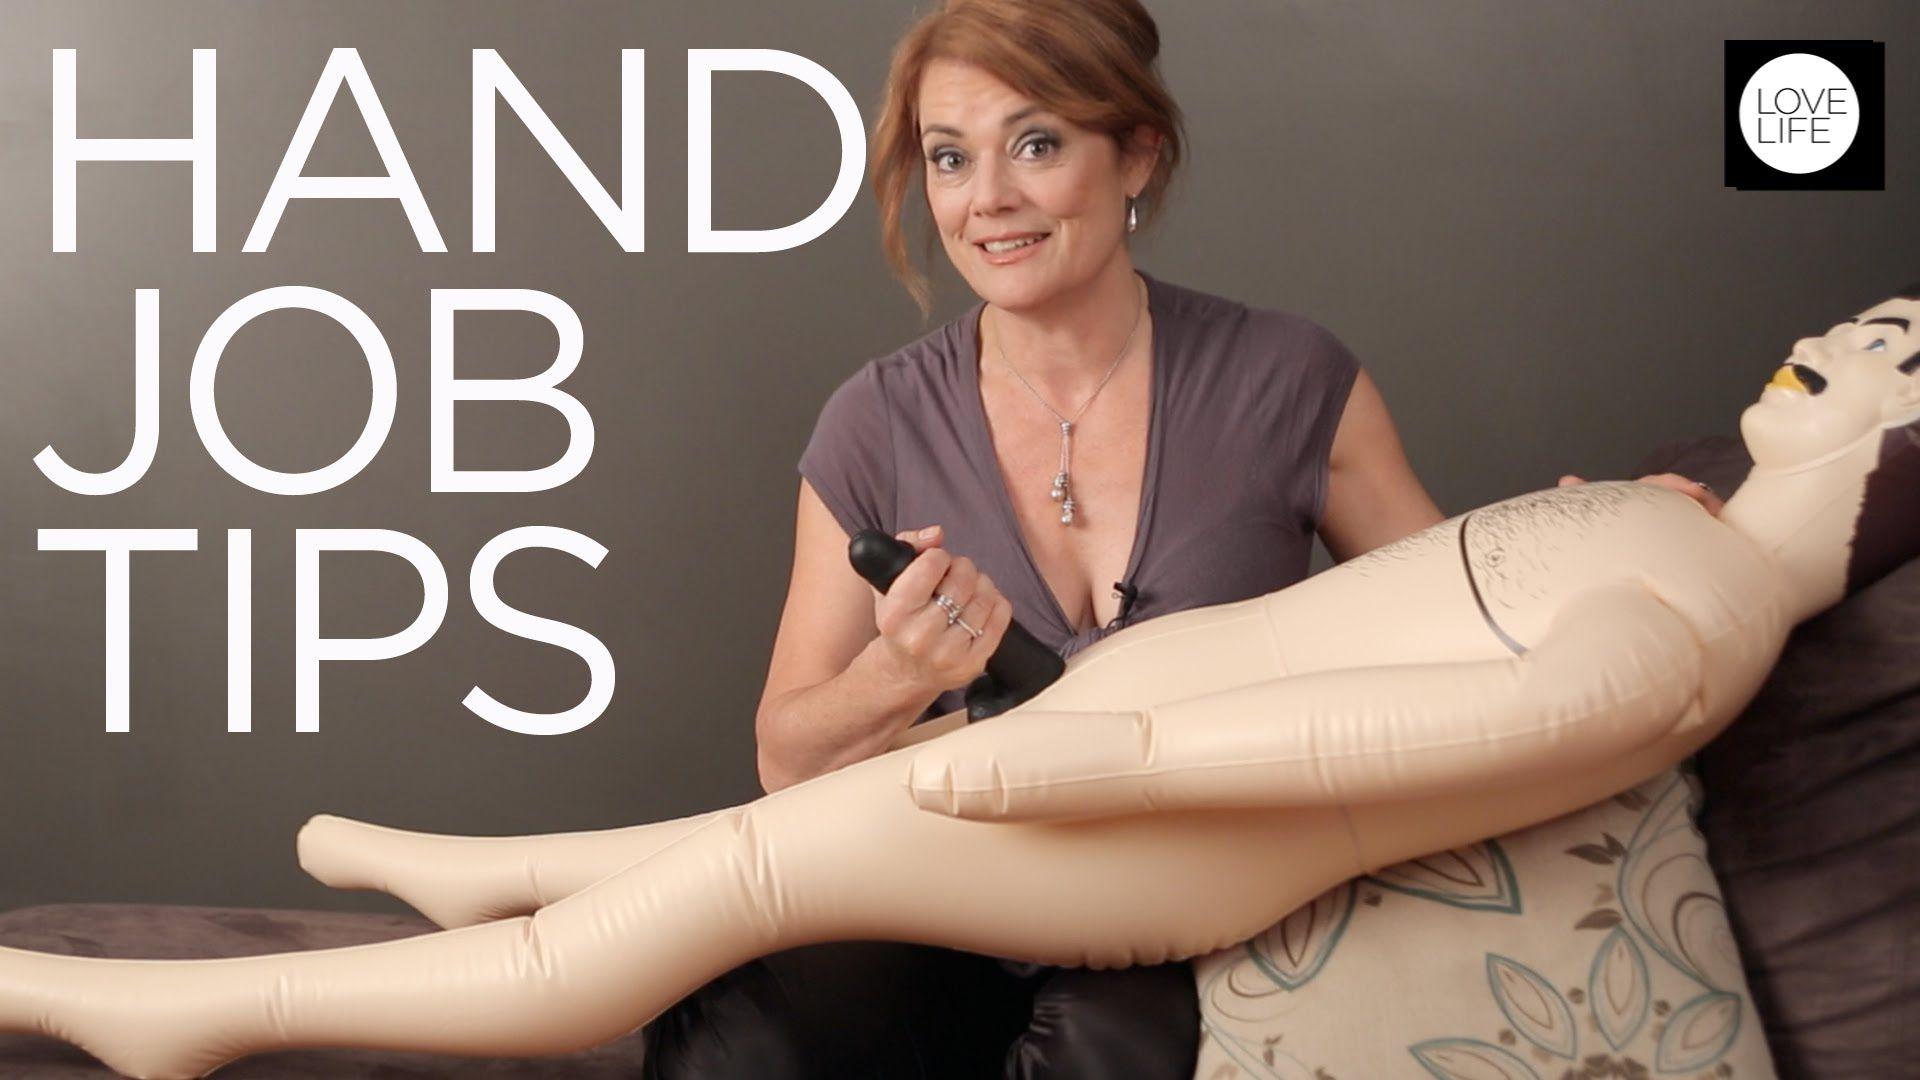 Ancient hand jobs